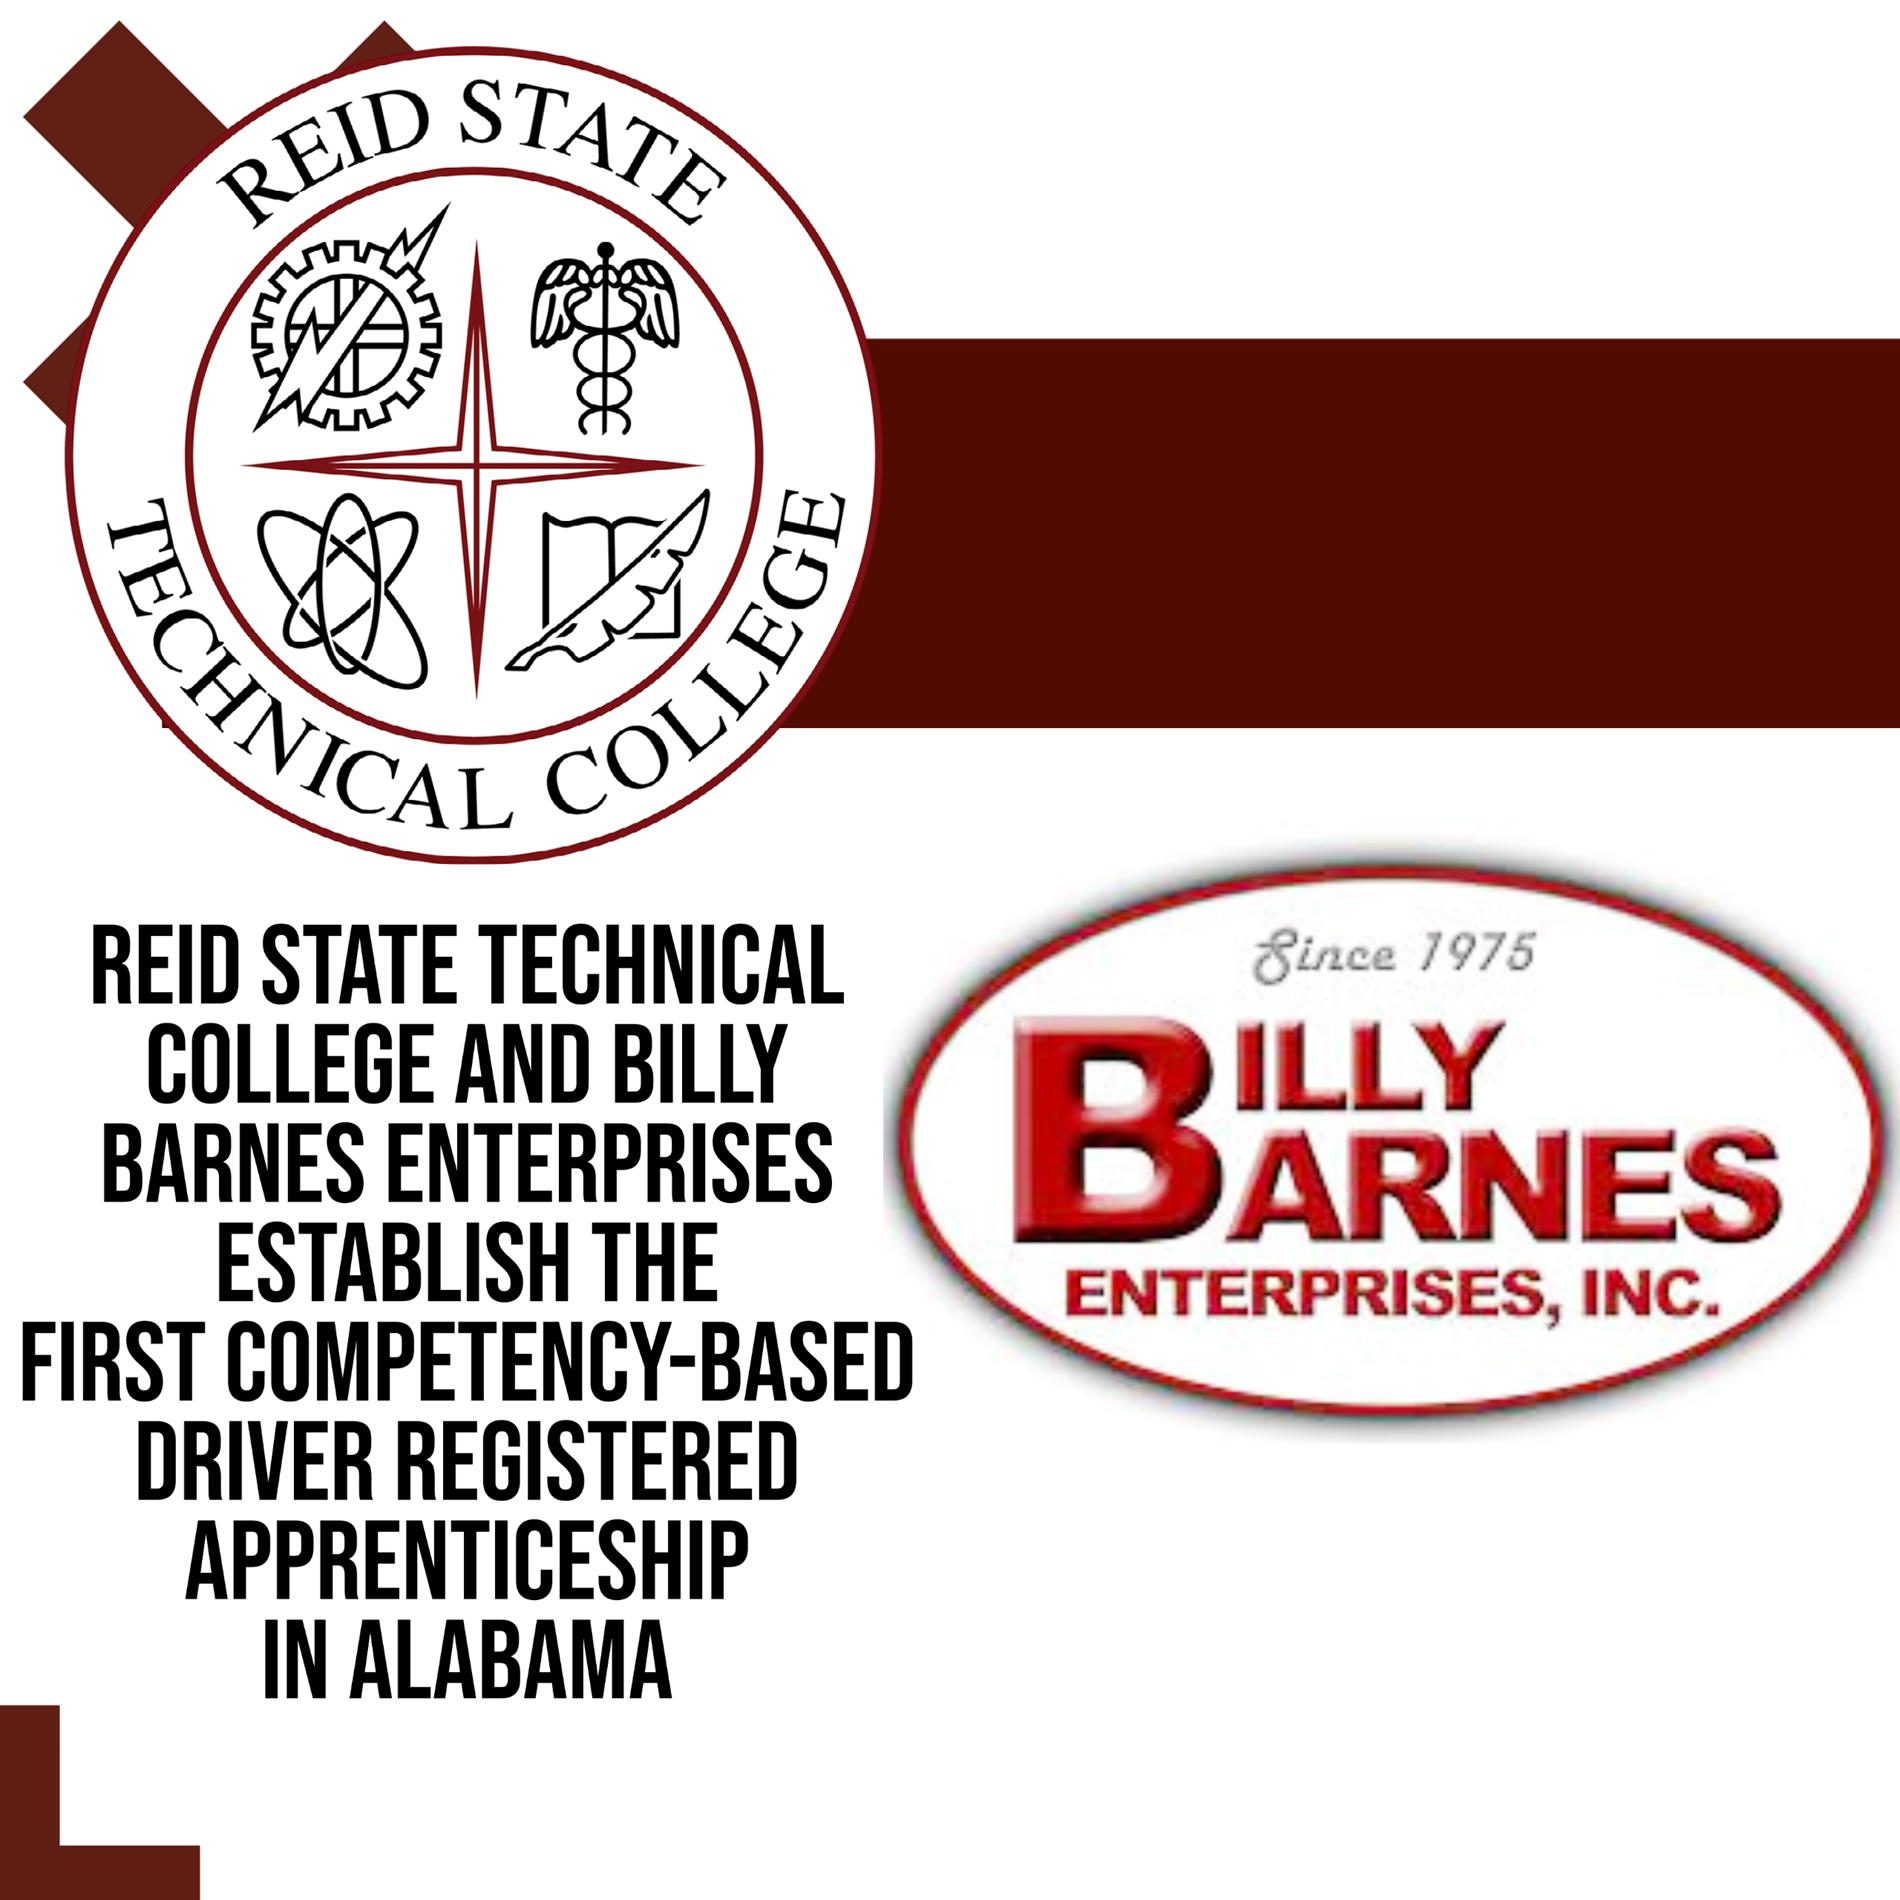 RSTC Billy Barnes